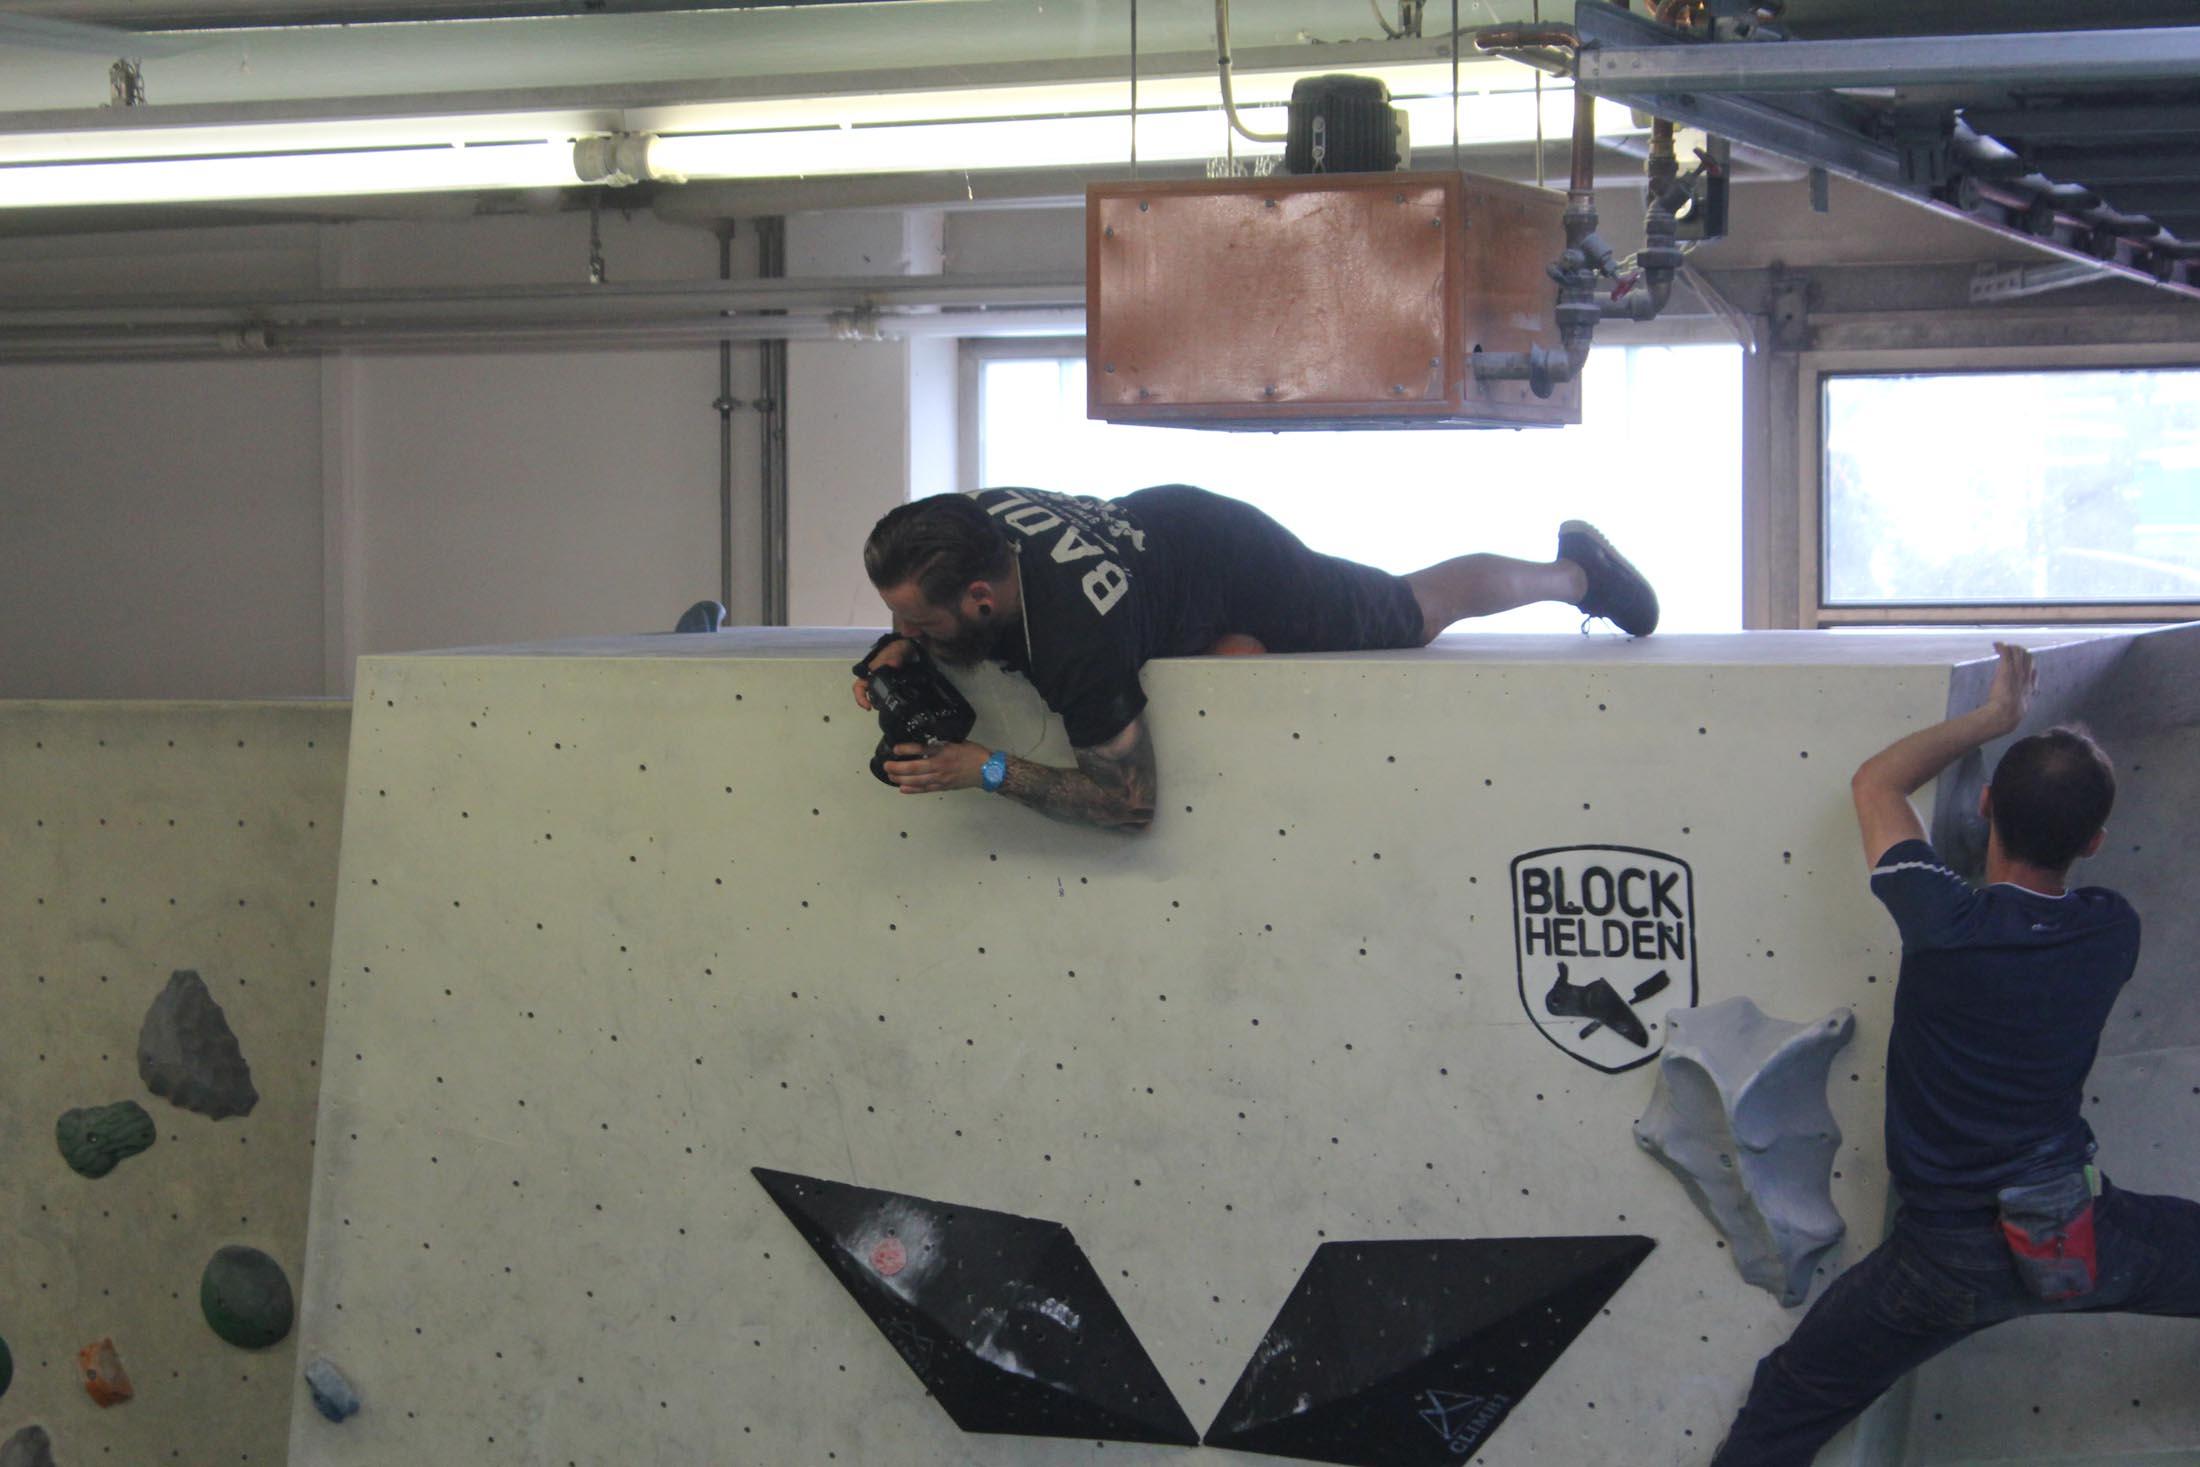 Quali, internationaler bouldercup Frankenjura 2016, BLOCKHELDEN Erlangen, Mammut, Bergfreunde.de, Boulderwettkampf07092016303